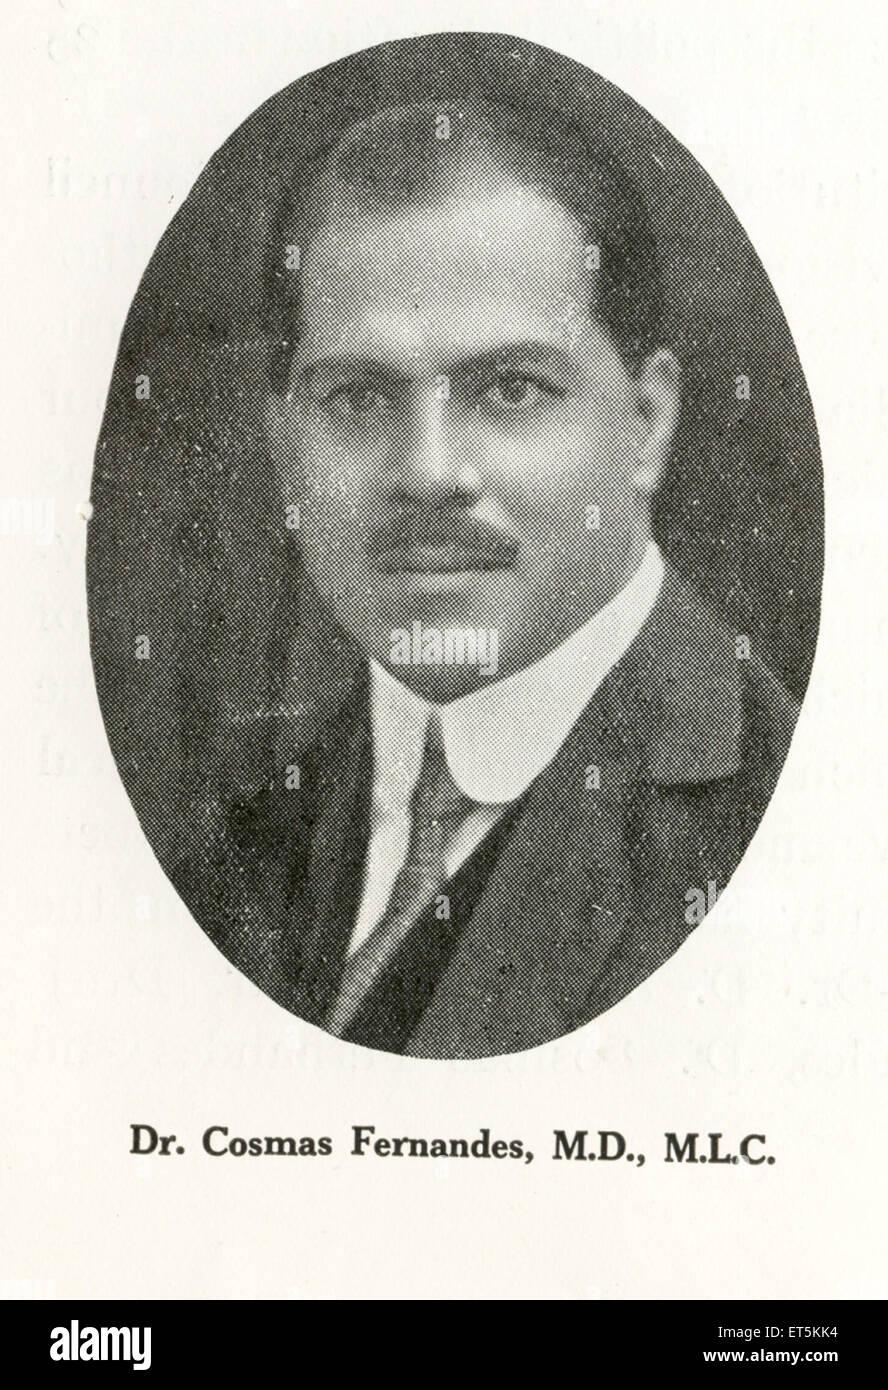 Catholic Community Dr. Cosmos Fernandes ; M.D ; M.L.C ; India NO MR - Stock Image